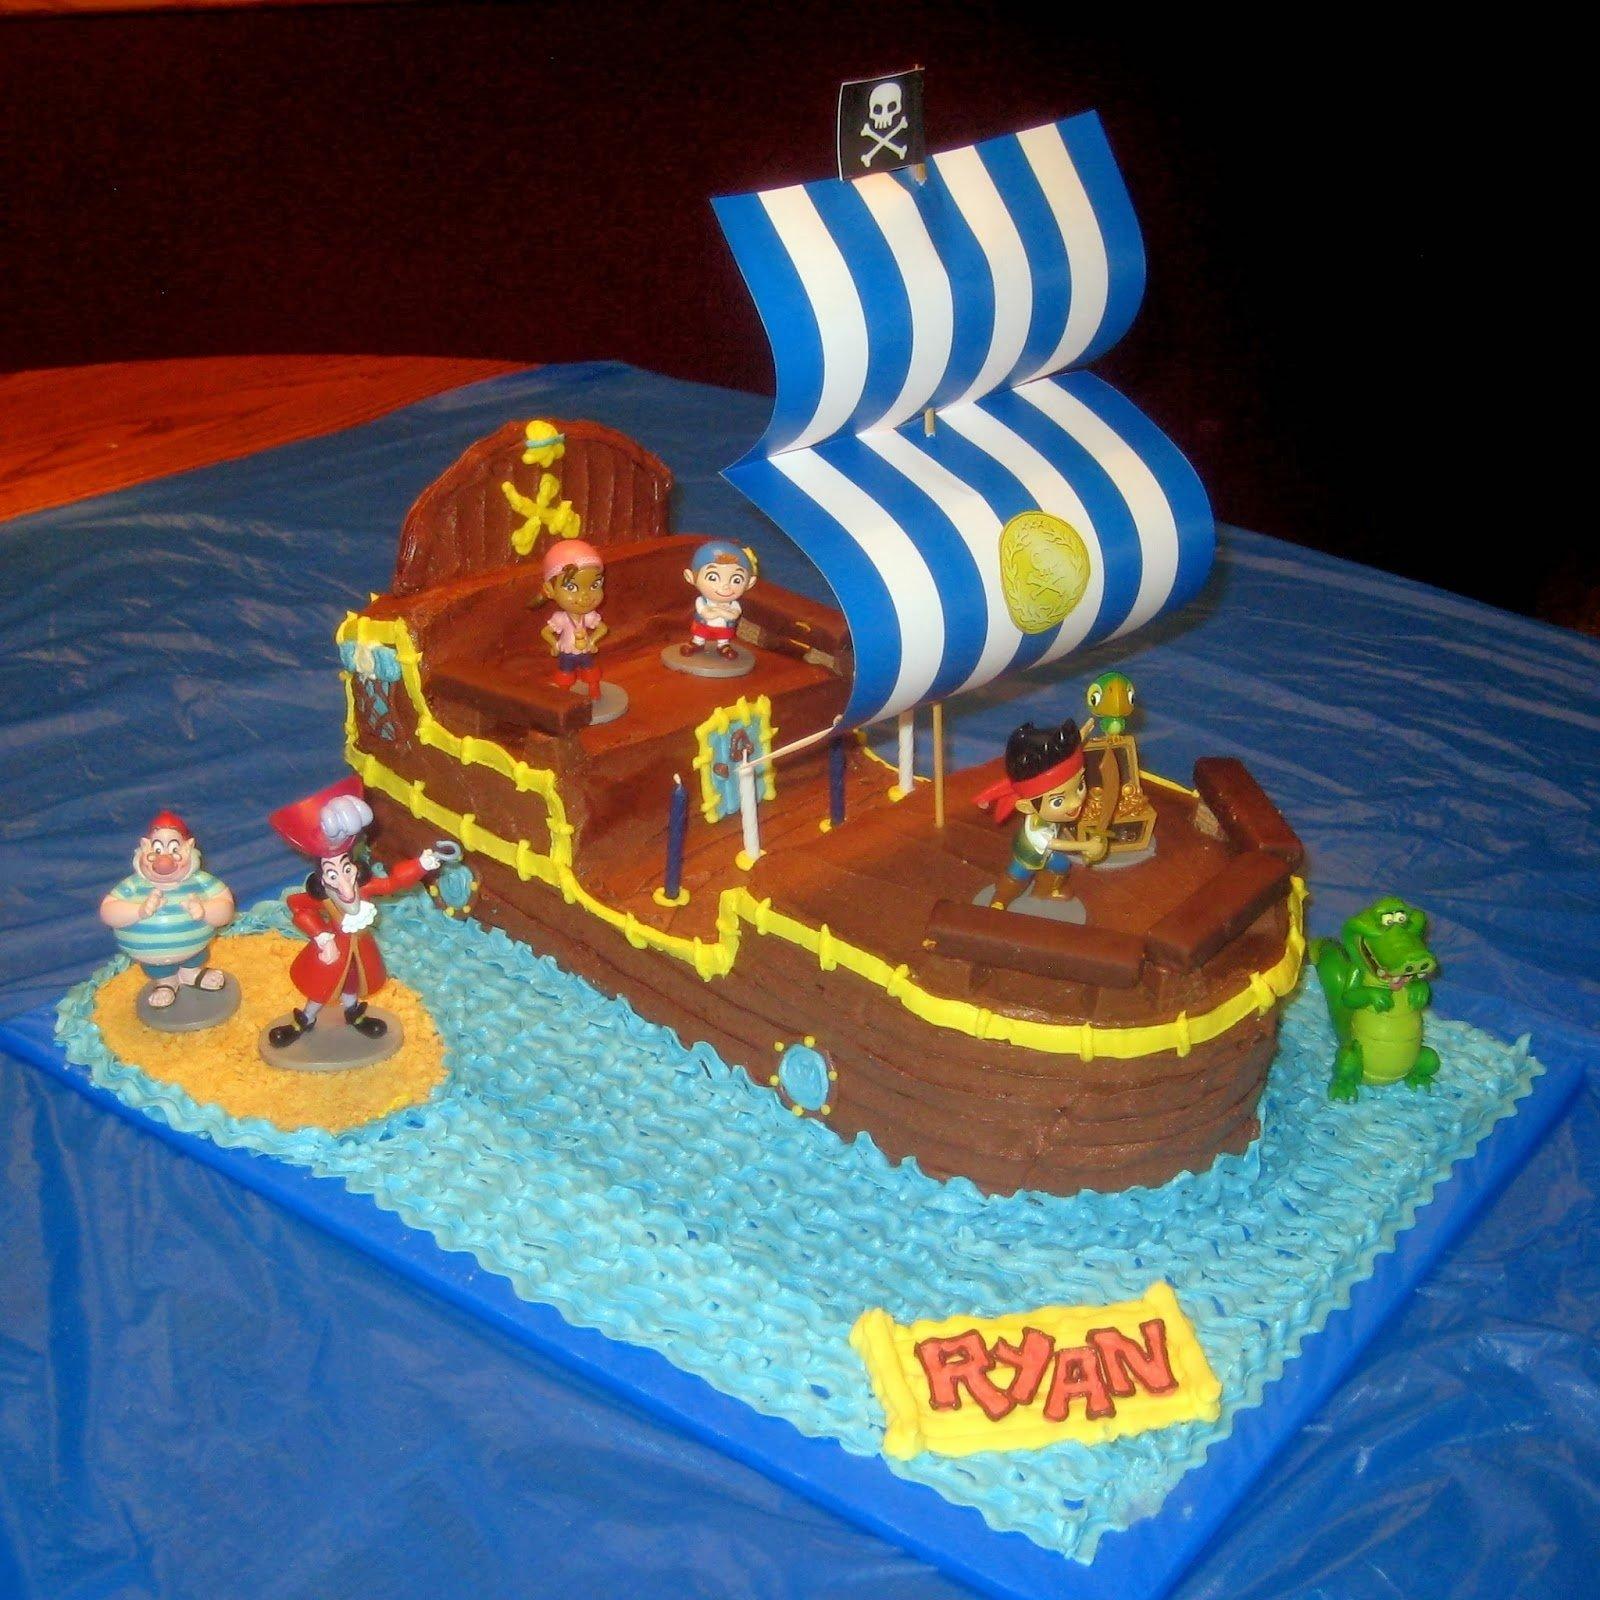 10 Nice Jake And The Neverland Pirate Cake Ideas cobo bucky the pirate ship cake jake and the neverland pirates 1 2020